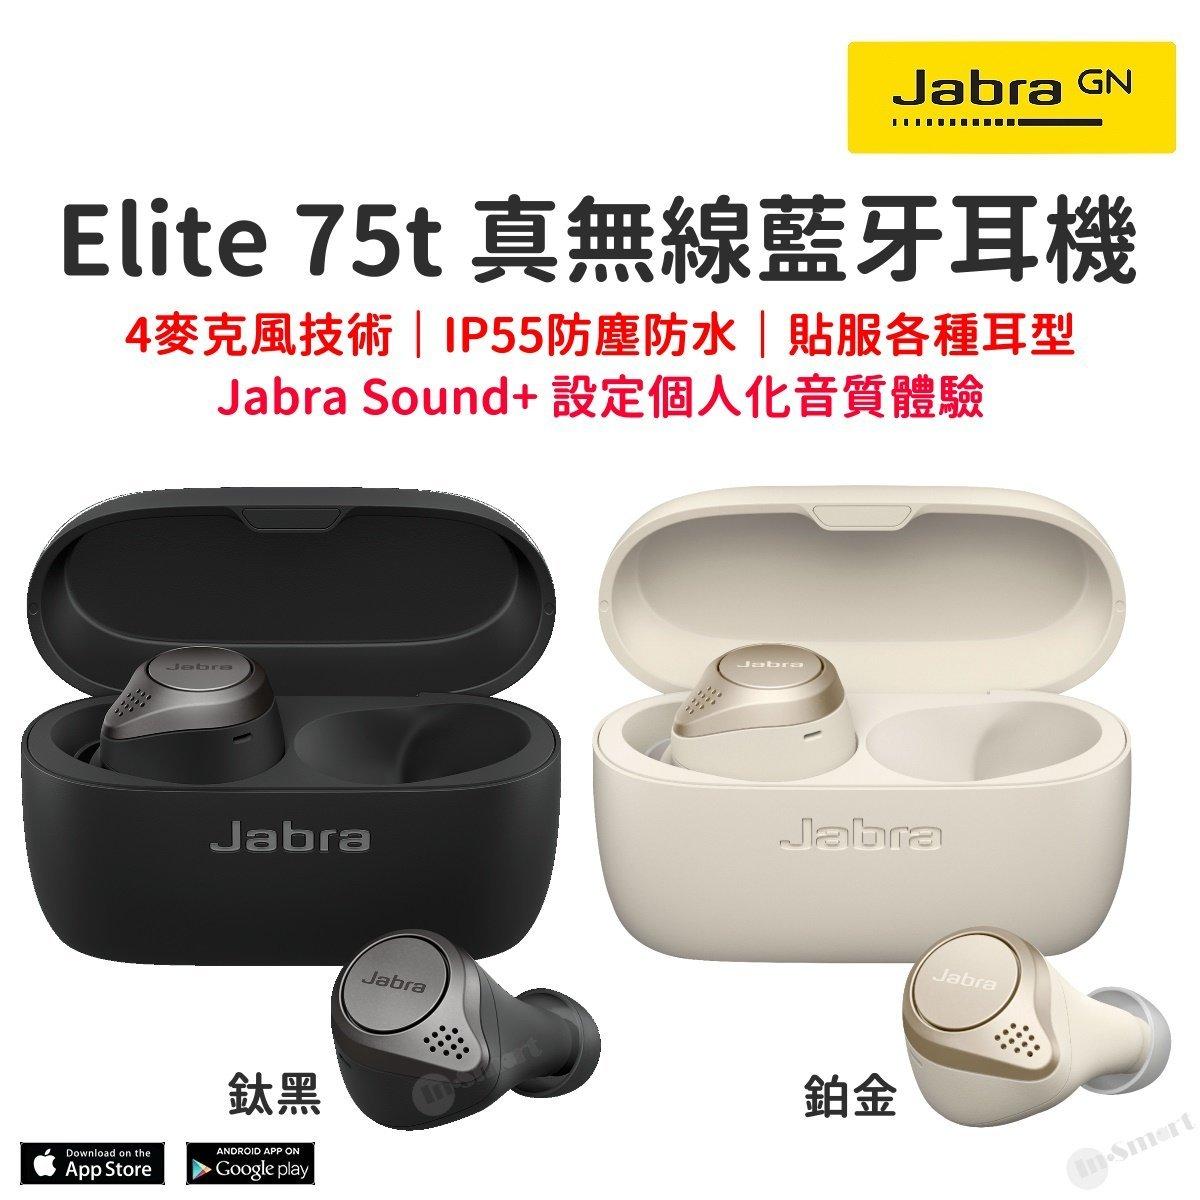 Elite 75t True Wireless Earbuds with Charging Case (Titanium Black)